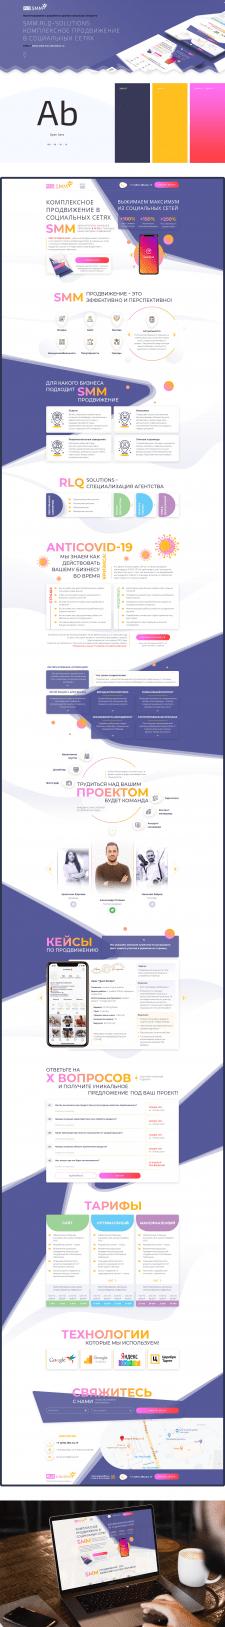 RLQ.SMM | smm.rlq-solutions.ru